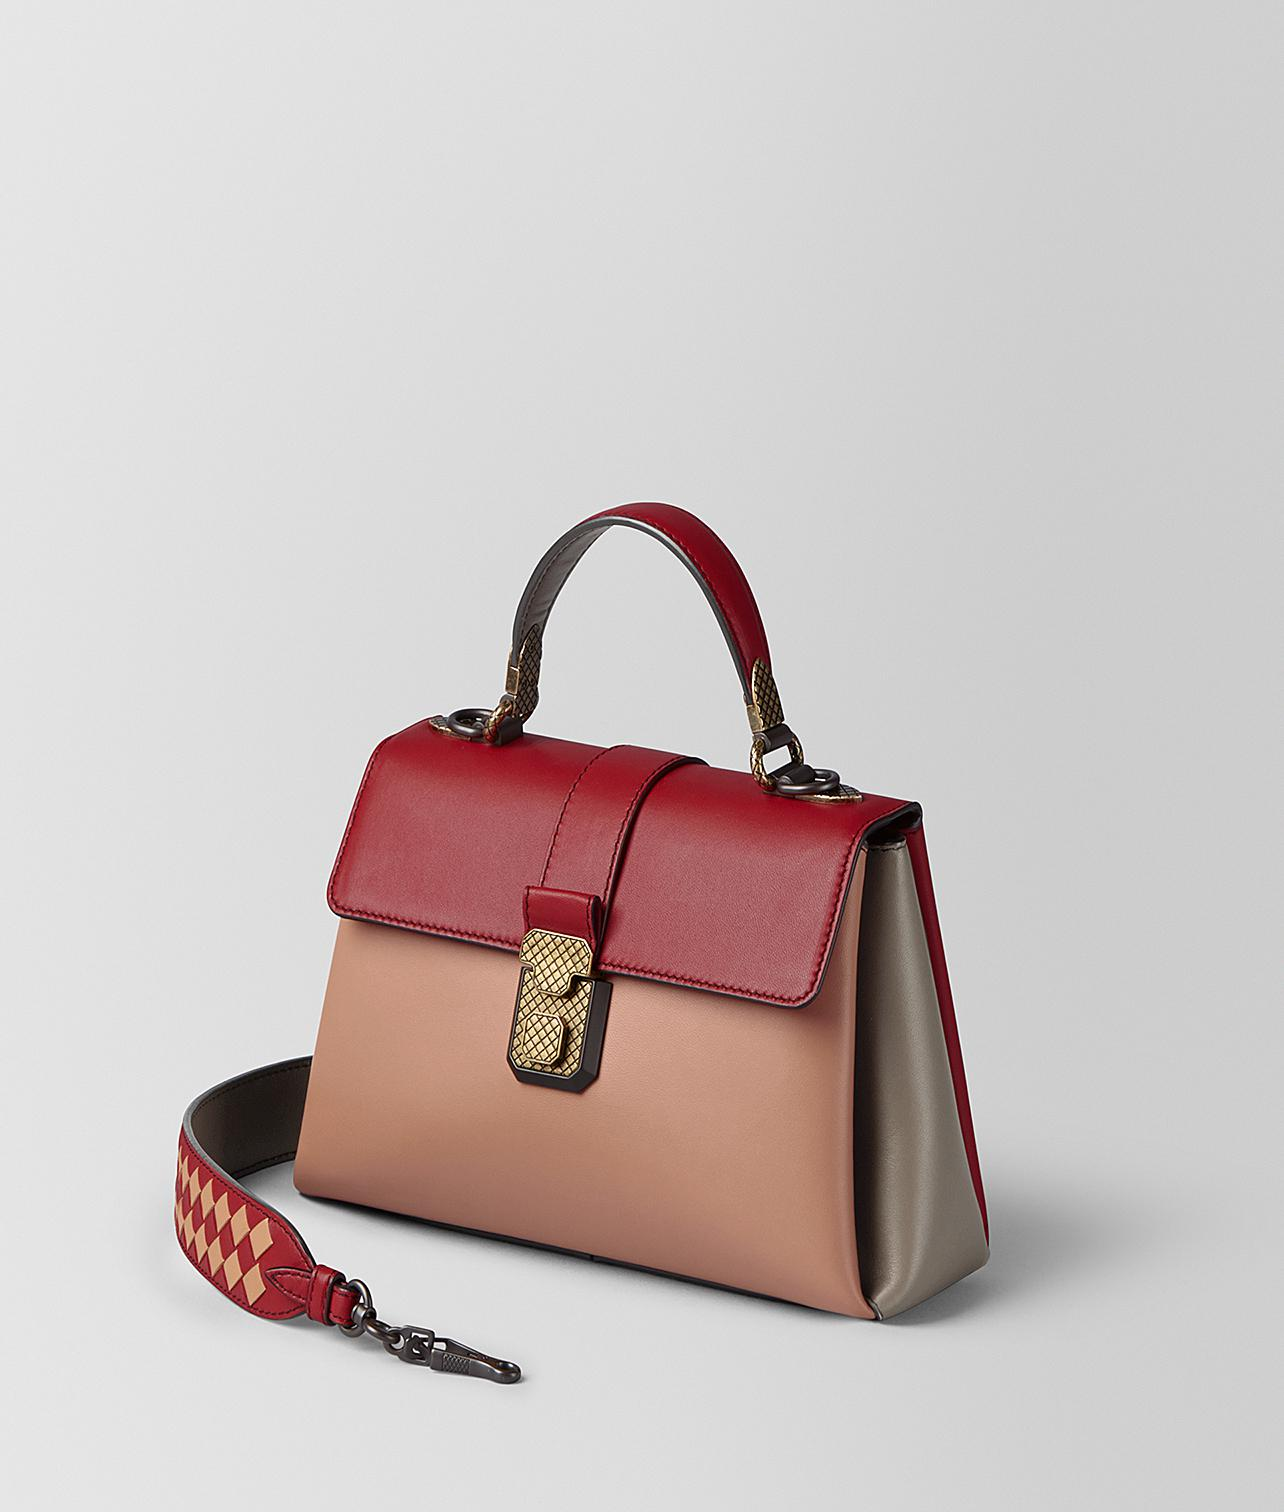 8ecbe9d764e0 Lyst - Bottega Veneta Small Piazza Bag in Red